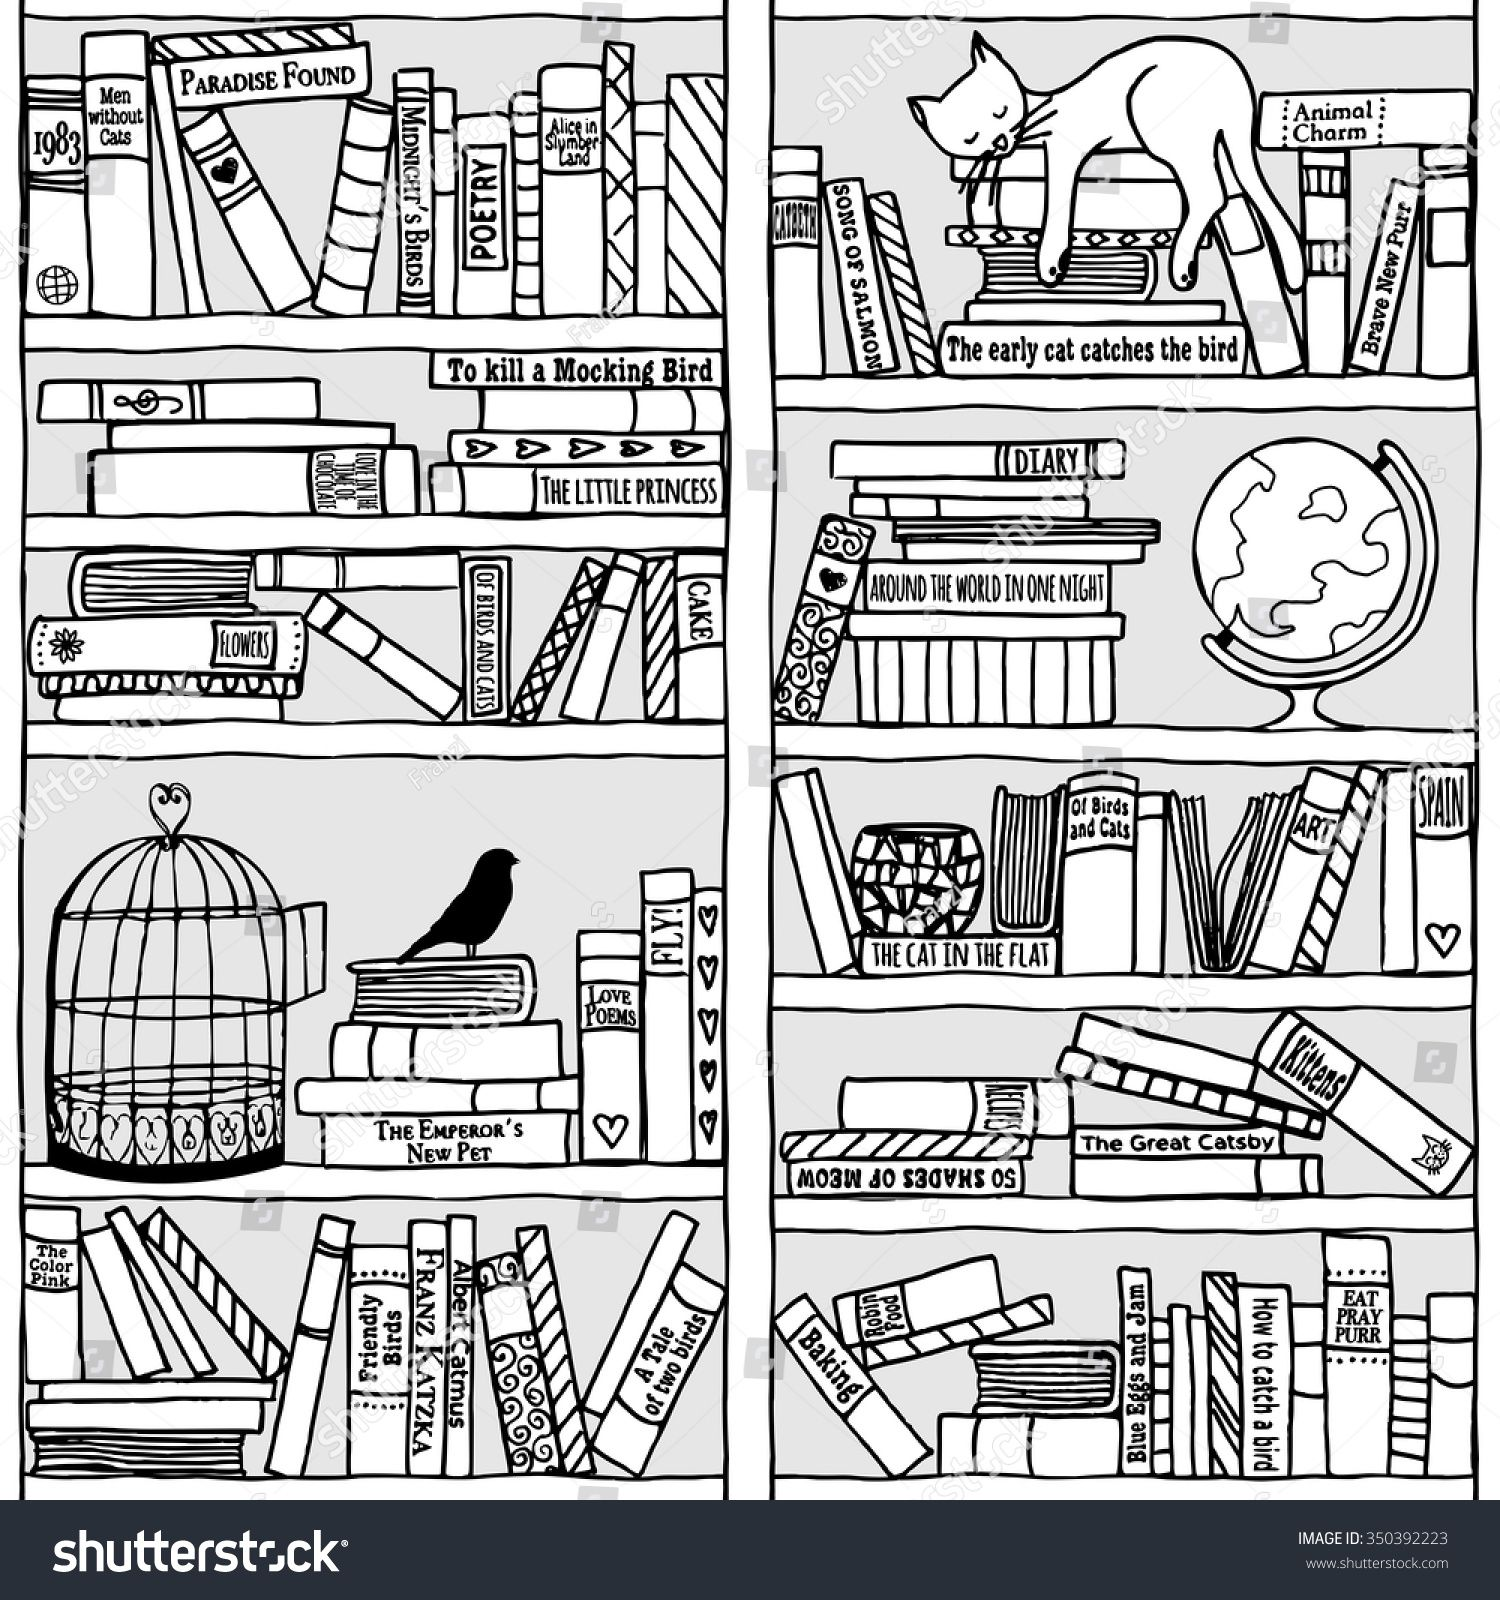 jpg library library Bookshelf vector hand drawn. With sleeping cat black